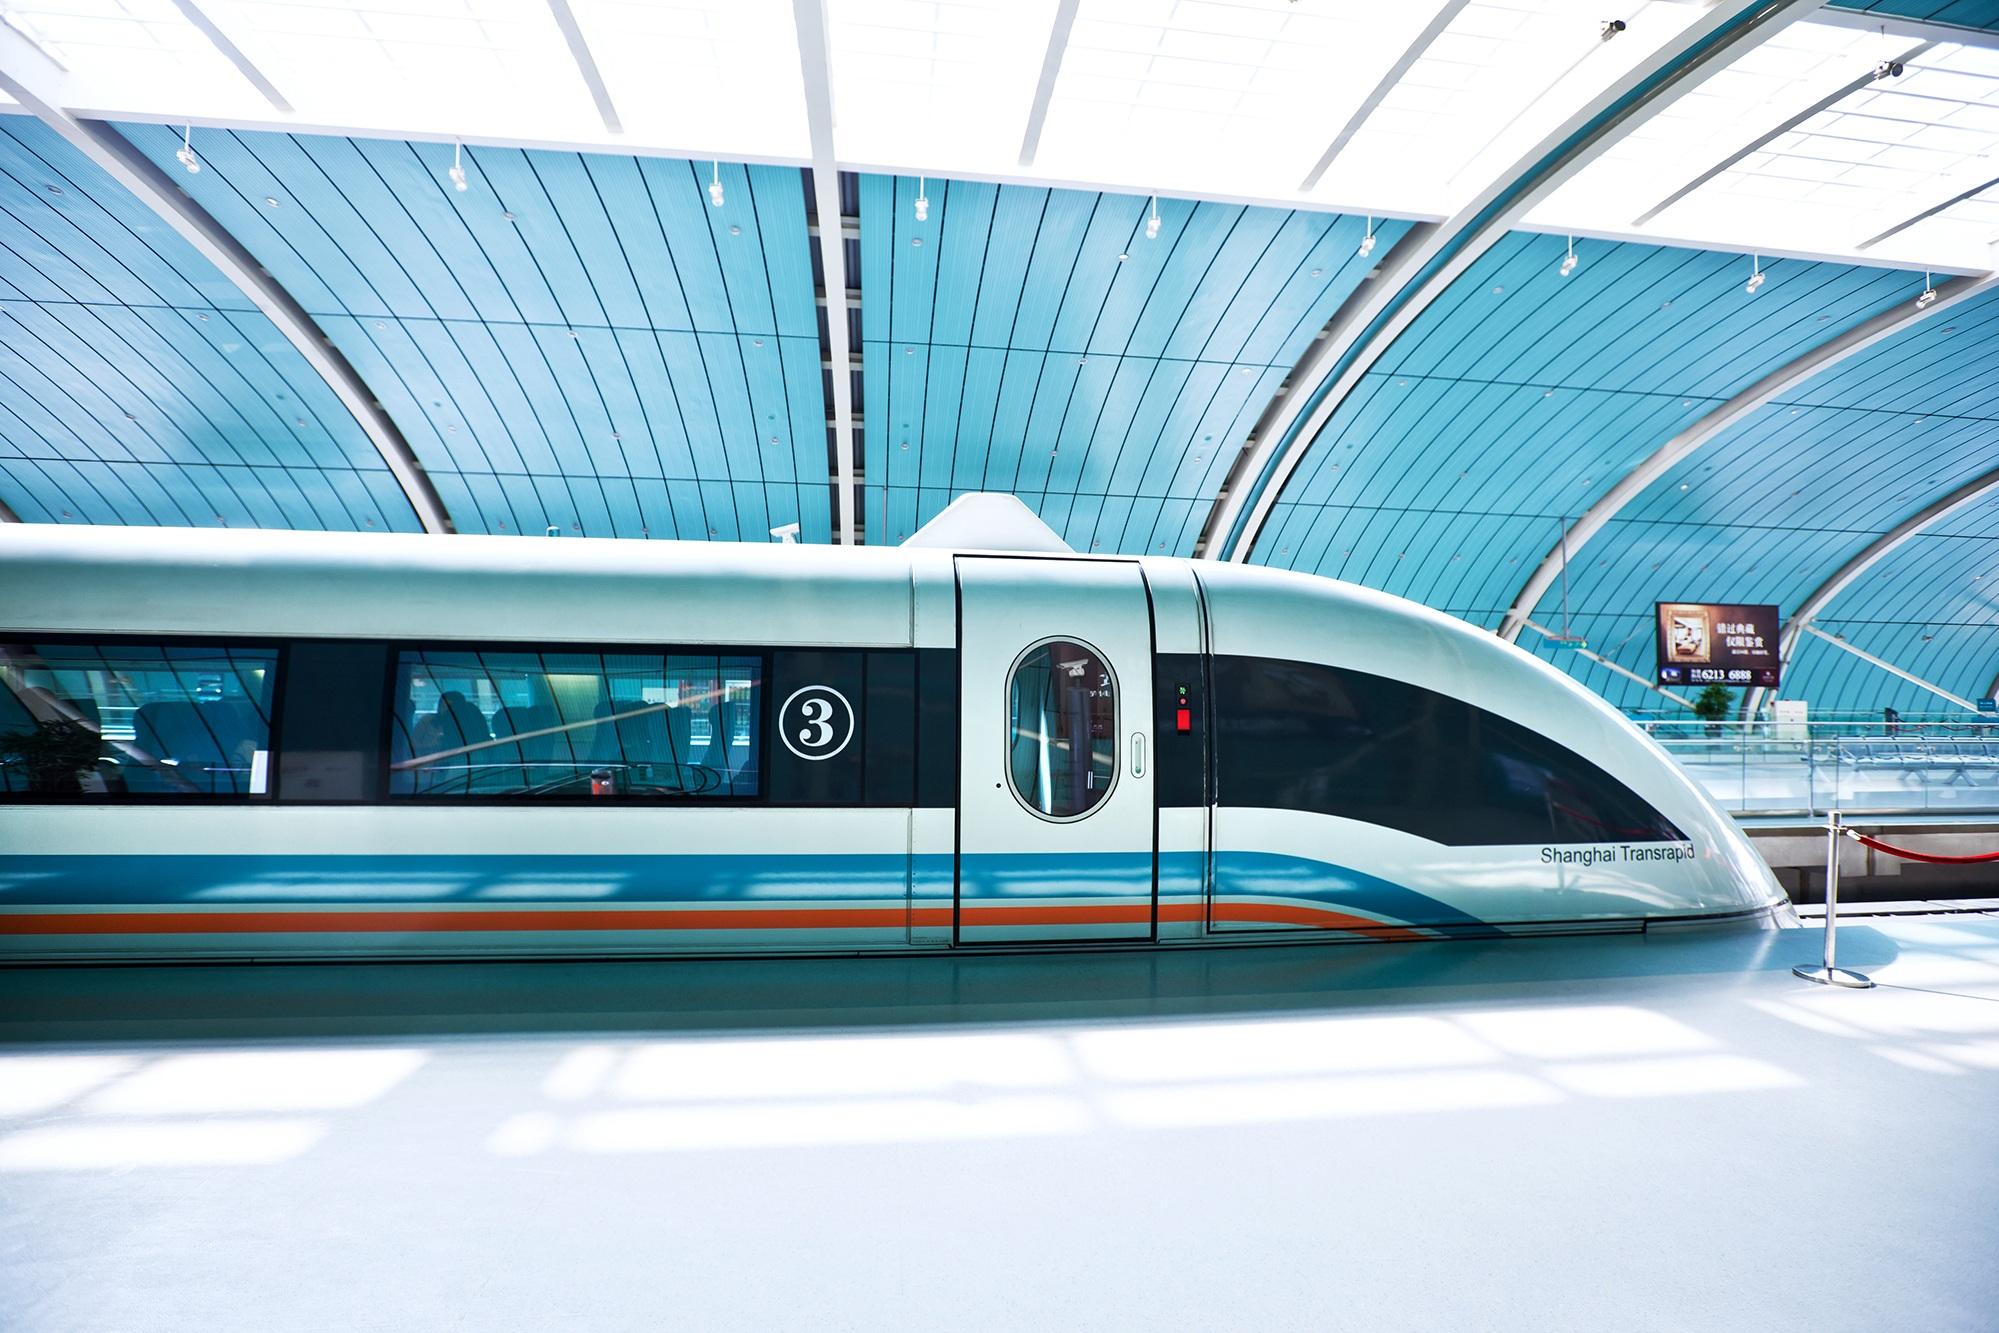 Superconducting Maglev Train, Shanghai